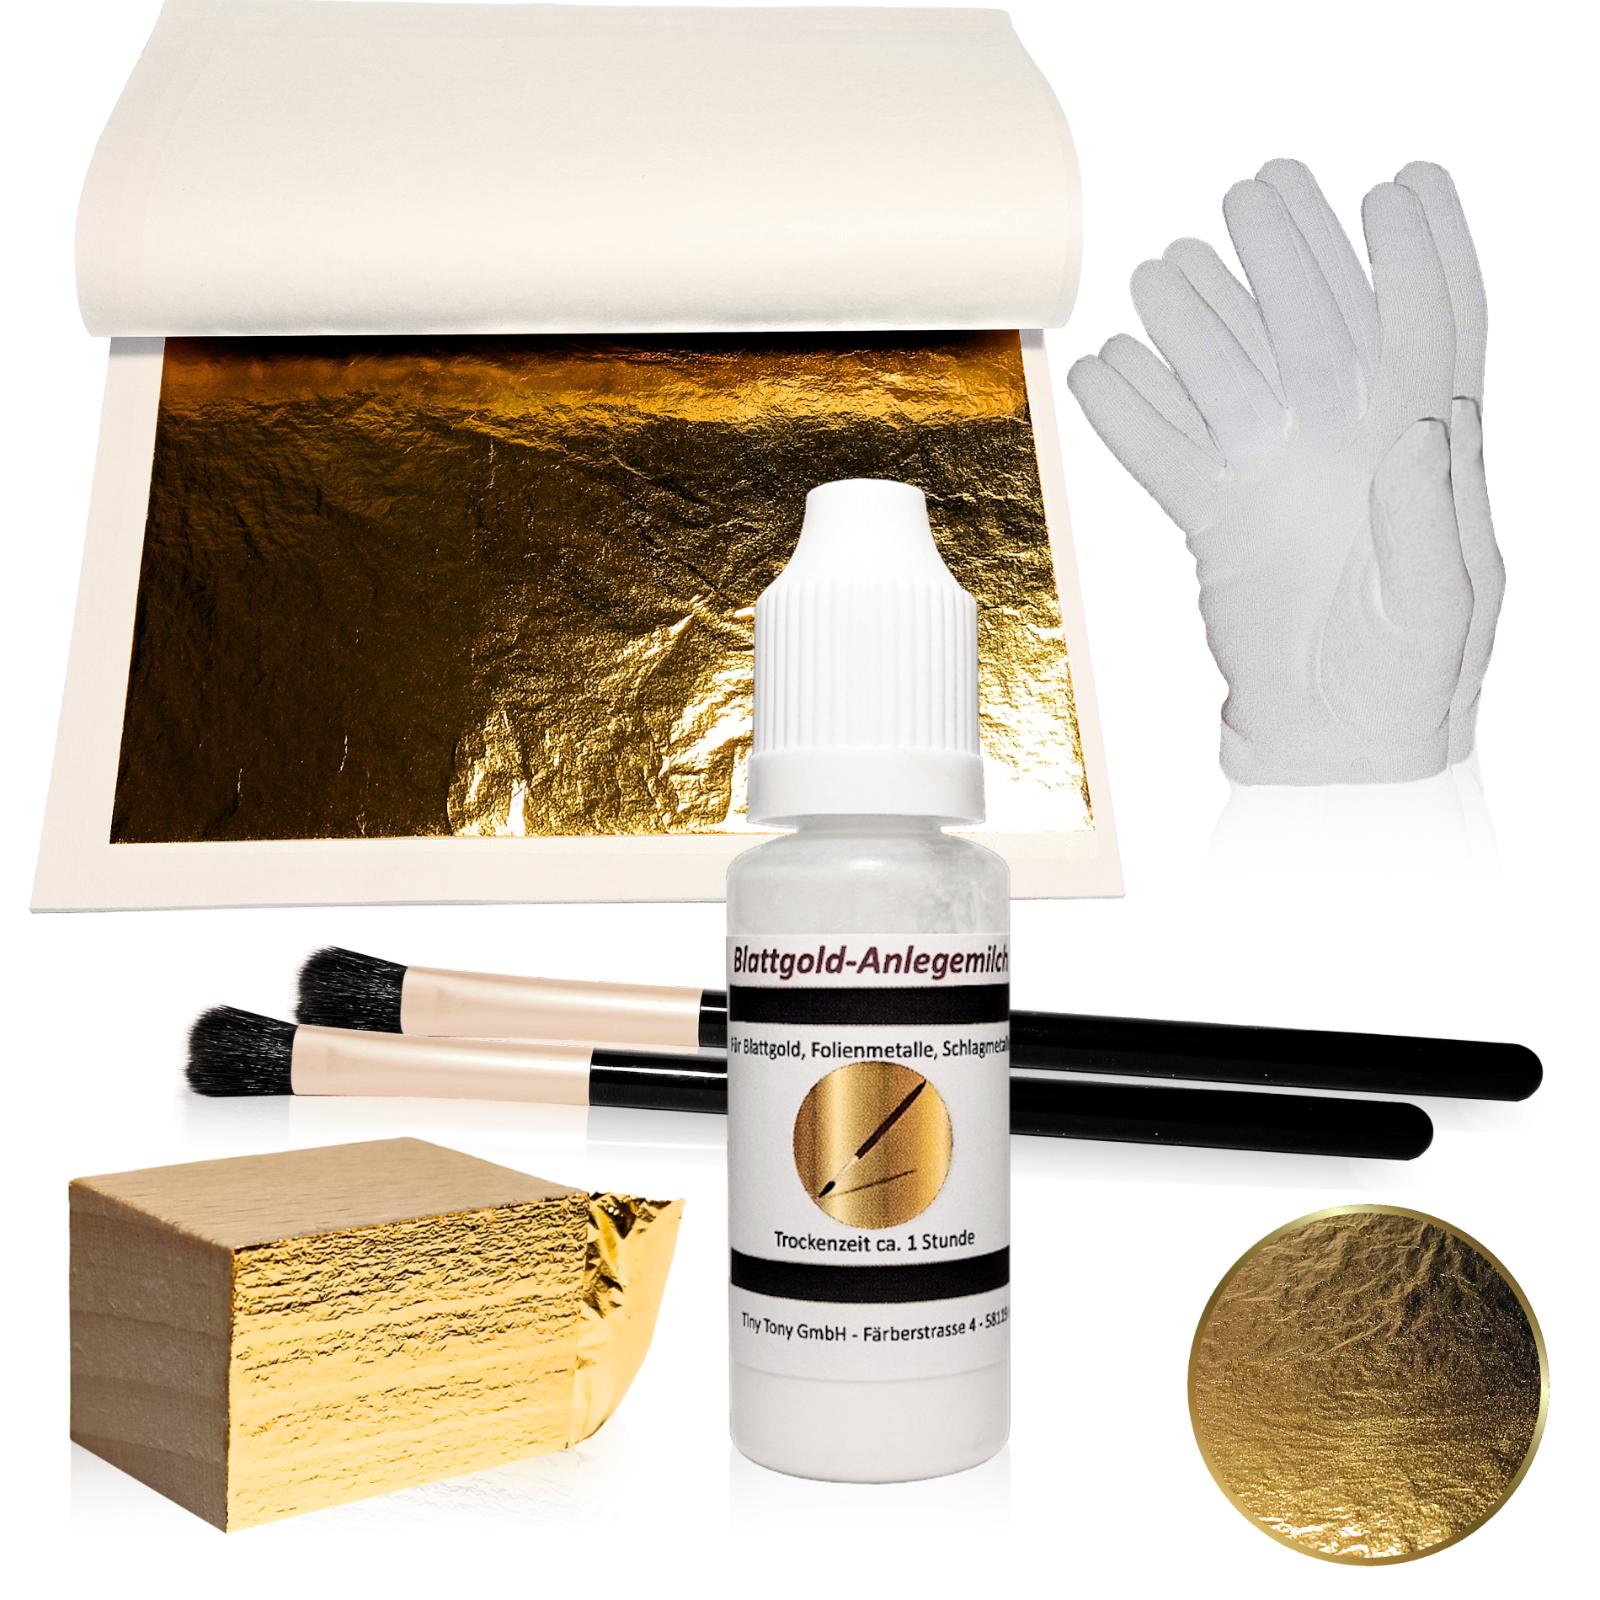 Blattgold SET Goldfolie 14cm Pinsel Anlegemilch Handschuhe Komplett Starter-Set